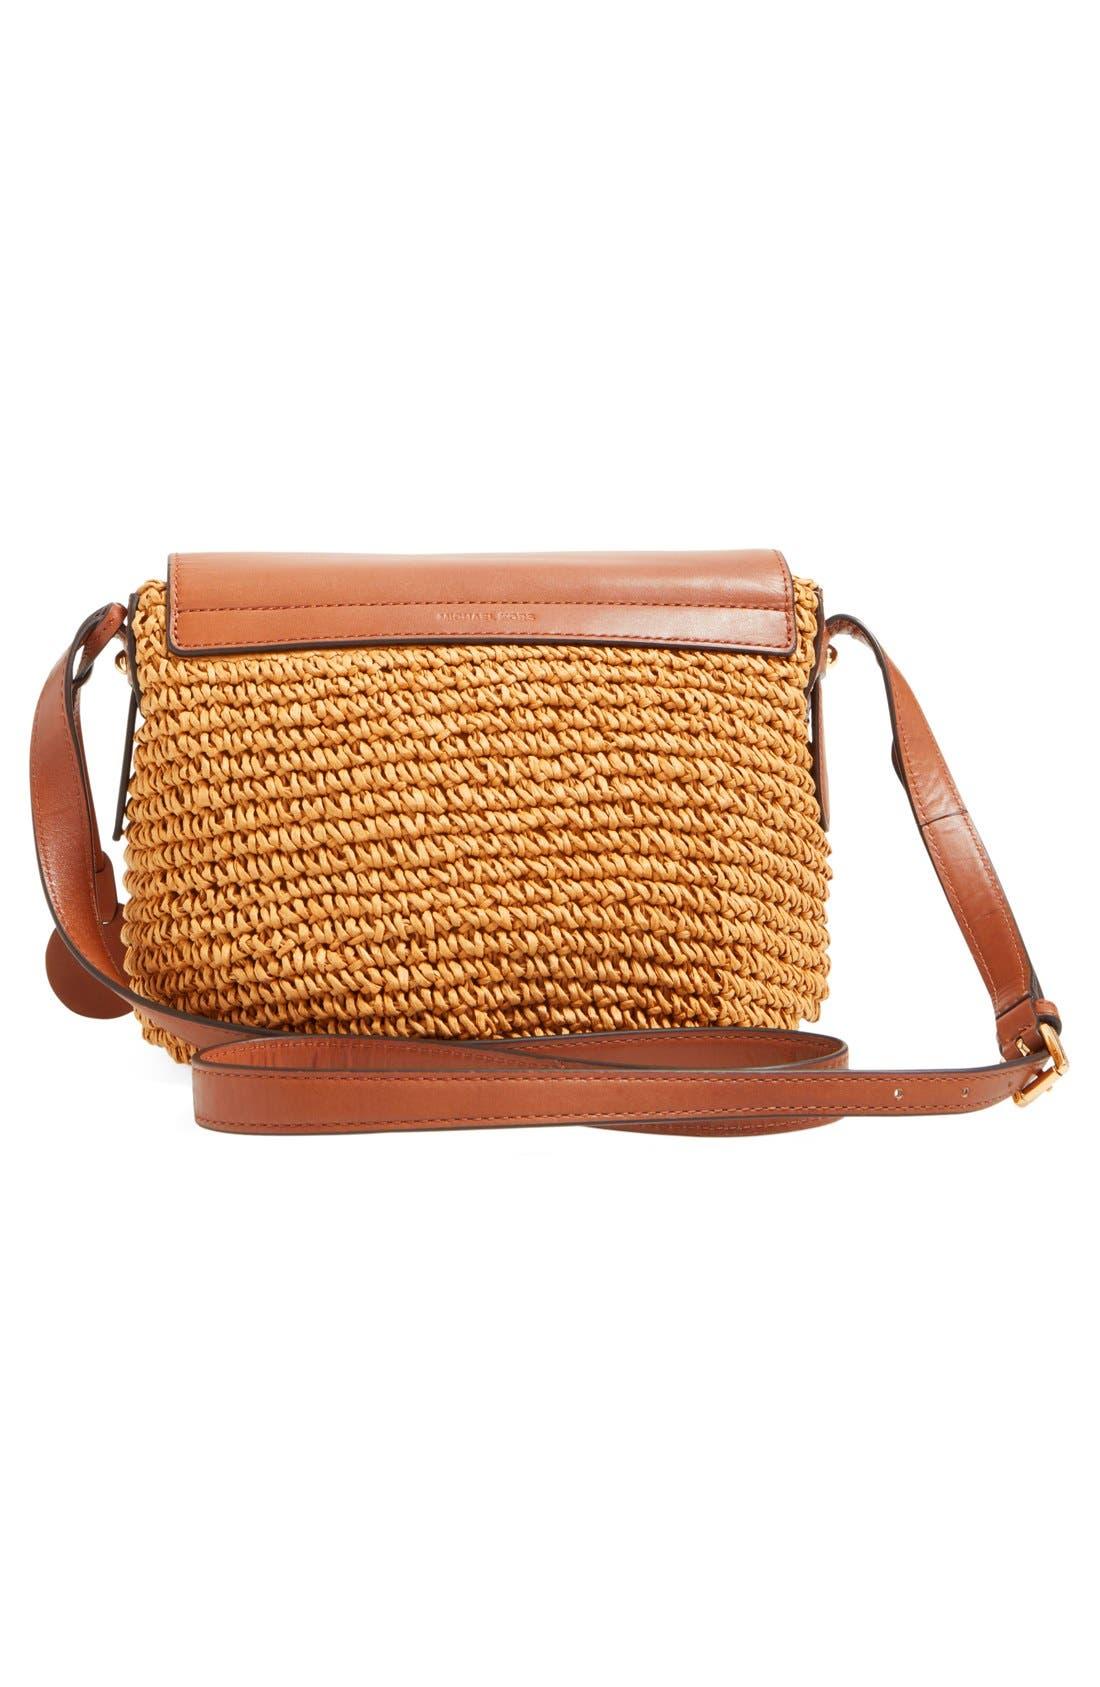 Alternate Image 3  - MICHAEL Michael Kors 'Medium Naomi' Straw & Leather Messenger Bag